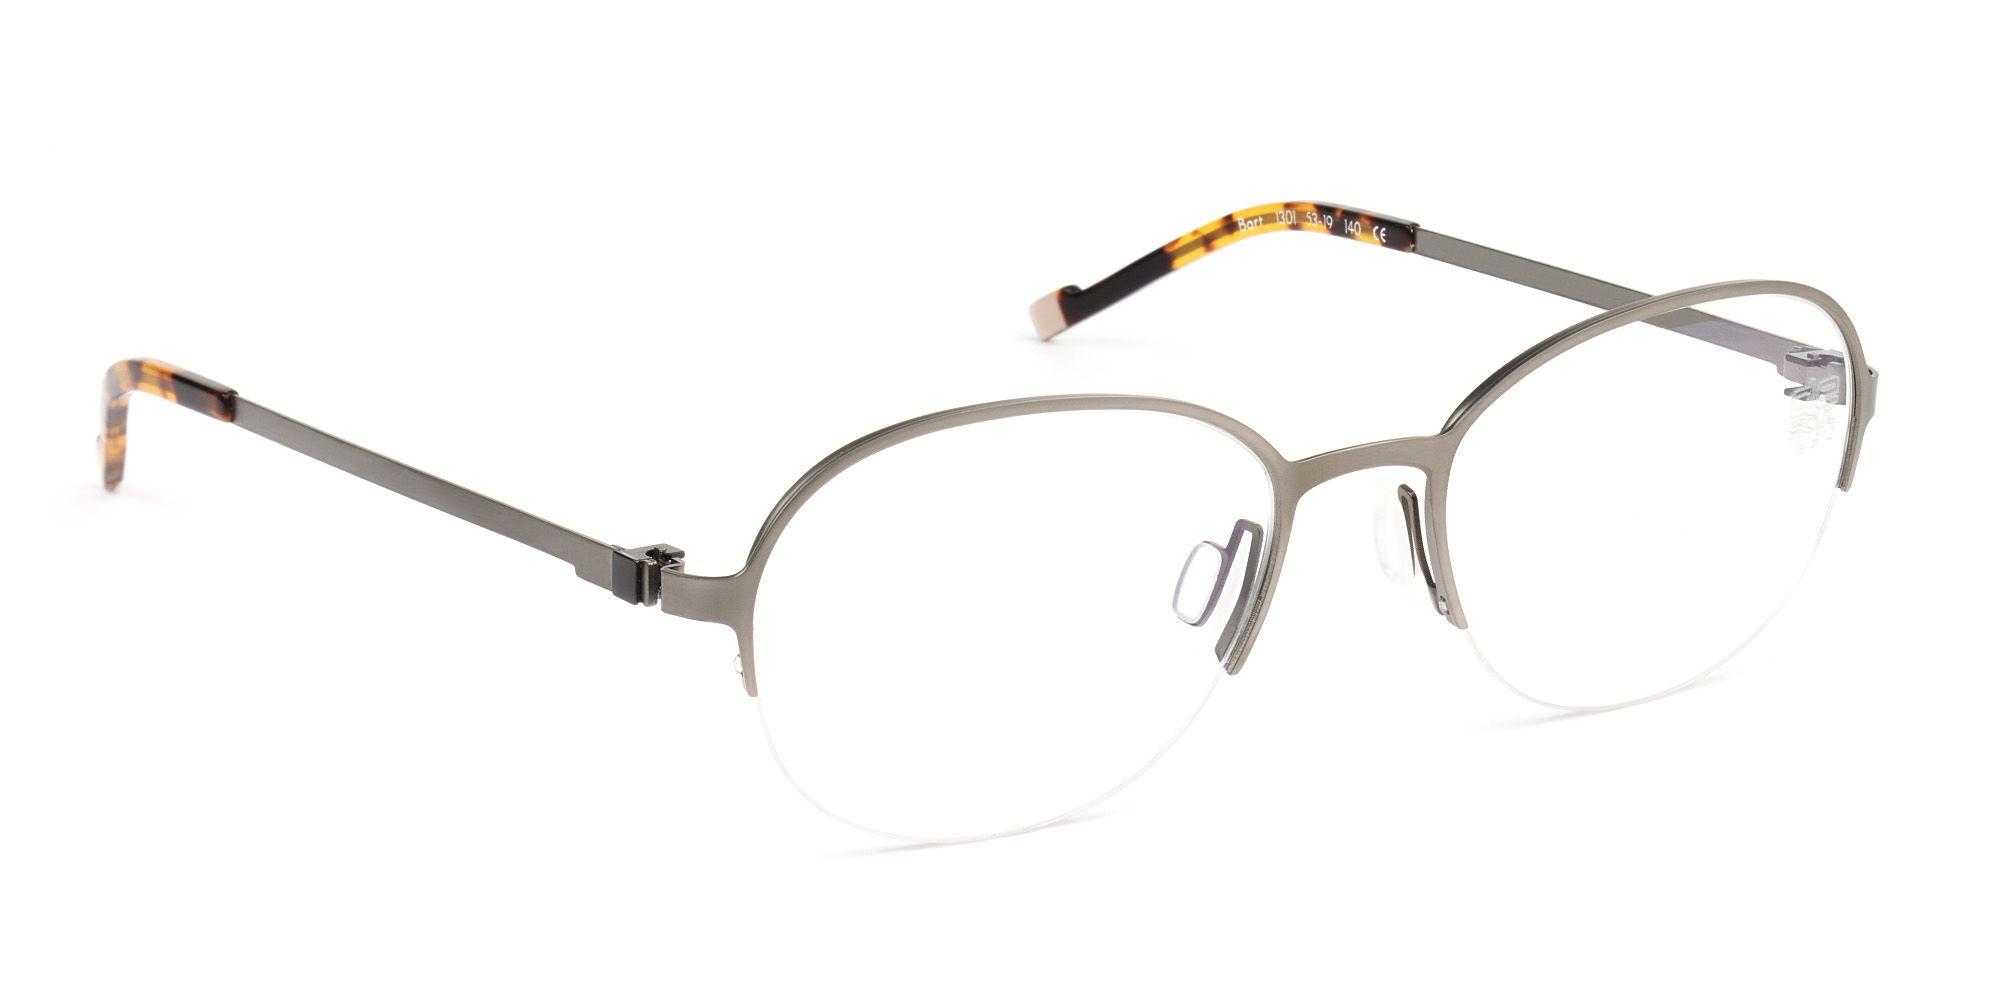 f9b377646257 De Stijl Holland 1924 eyewear  men semi-rimless eyeglasses frame BART in  color 1301